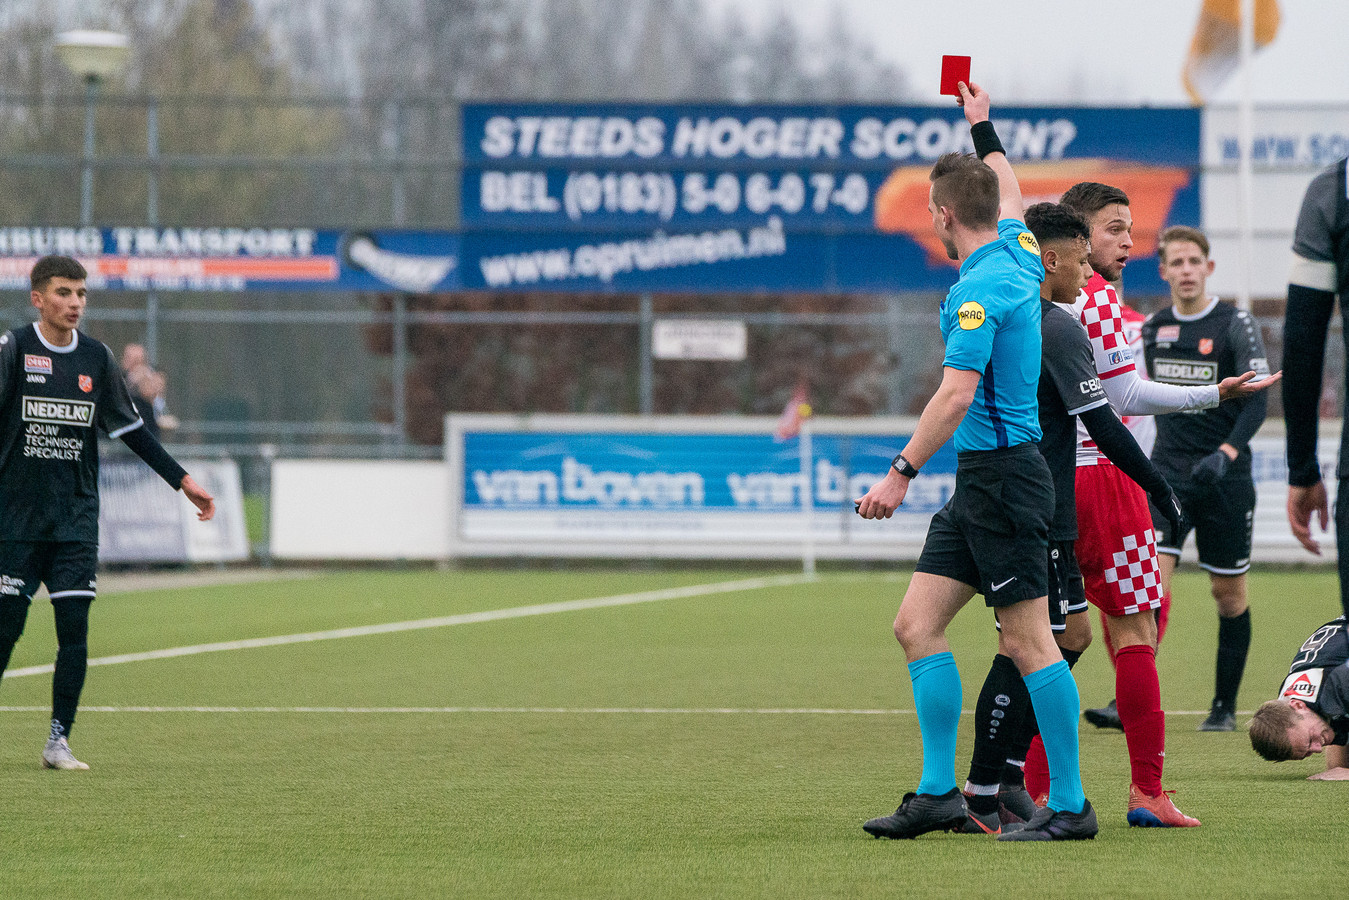 25-01-2020: Voetbal: Kozakken Boys v Jong Volendam: Werkendam 2e divisie Amateurs 20192020 L-R Luuk Timmer scheidsrechter geeft rode kaart aan Mark Veenhoven van Kozakken Boys